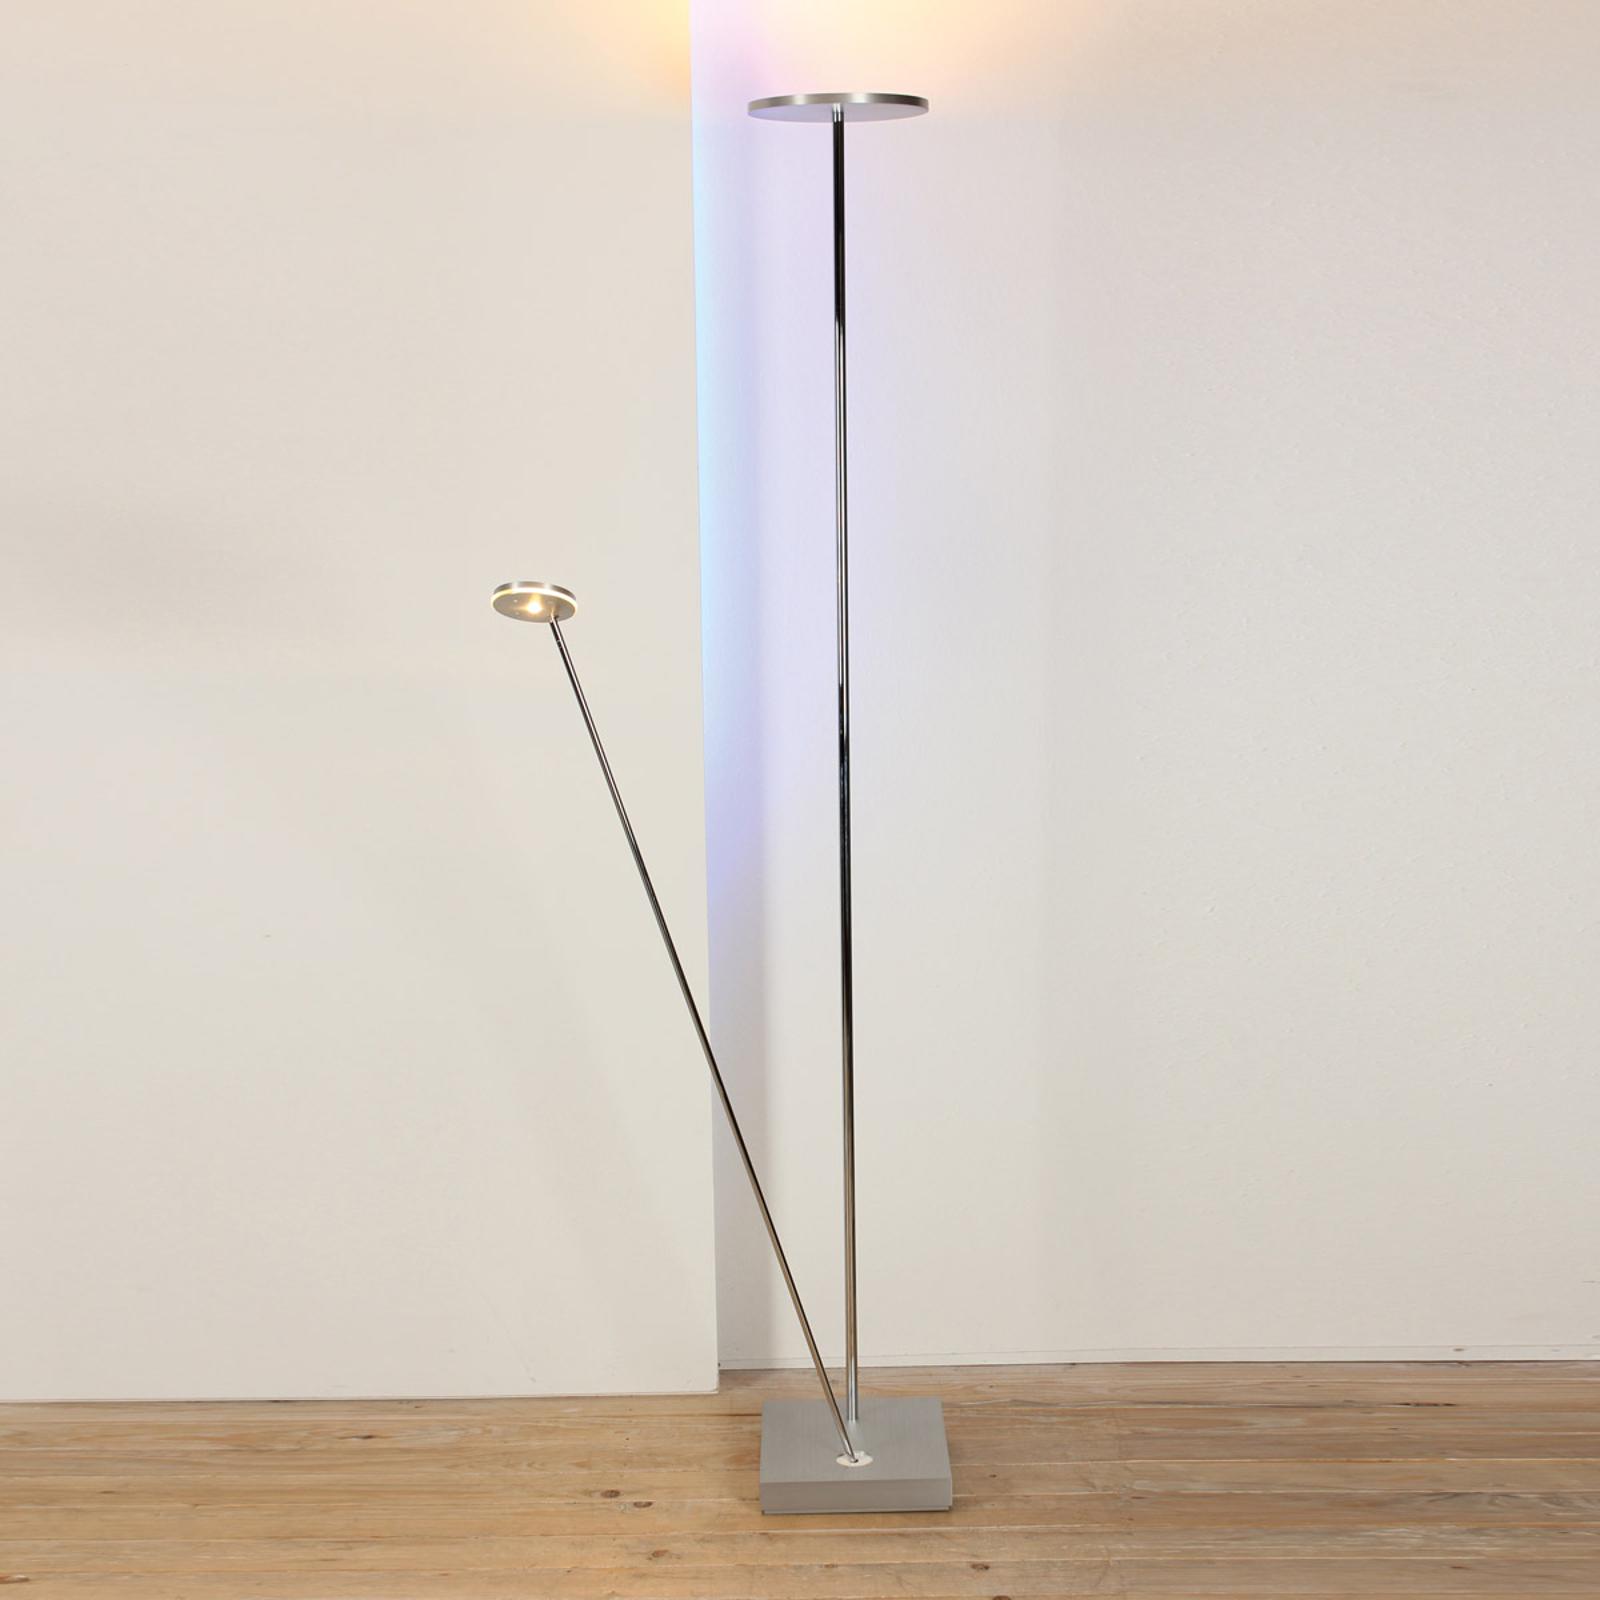 Integreret læselampe - LED uplight lampe Spot It